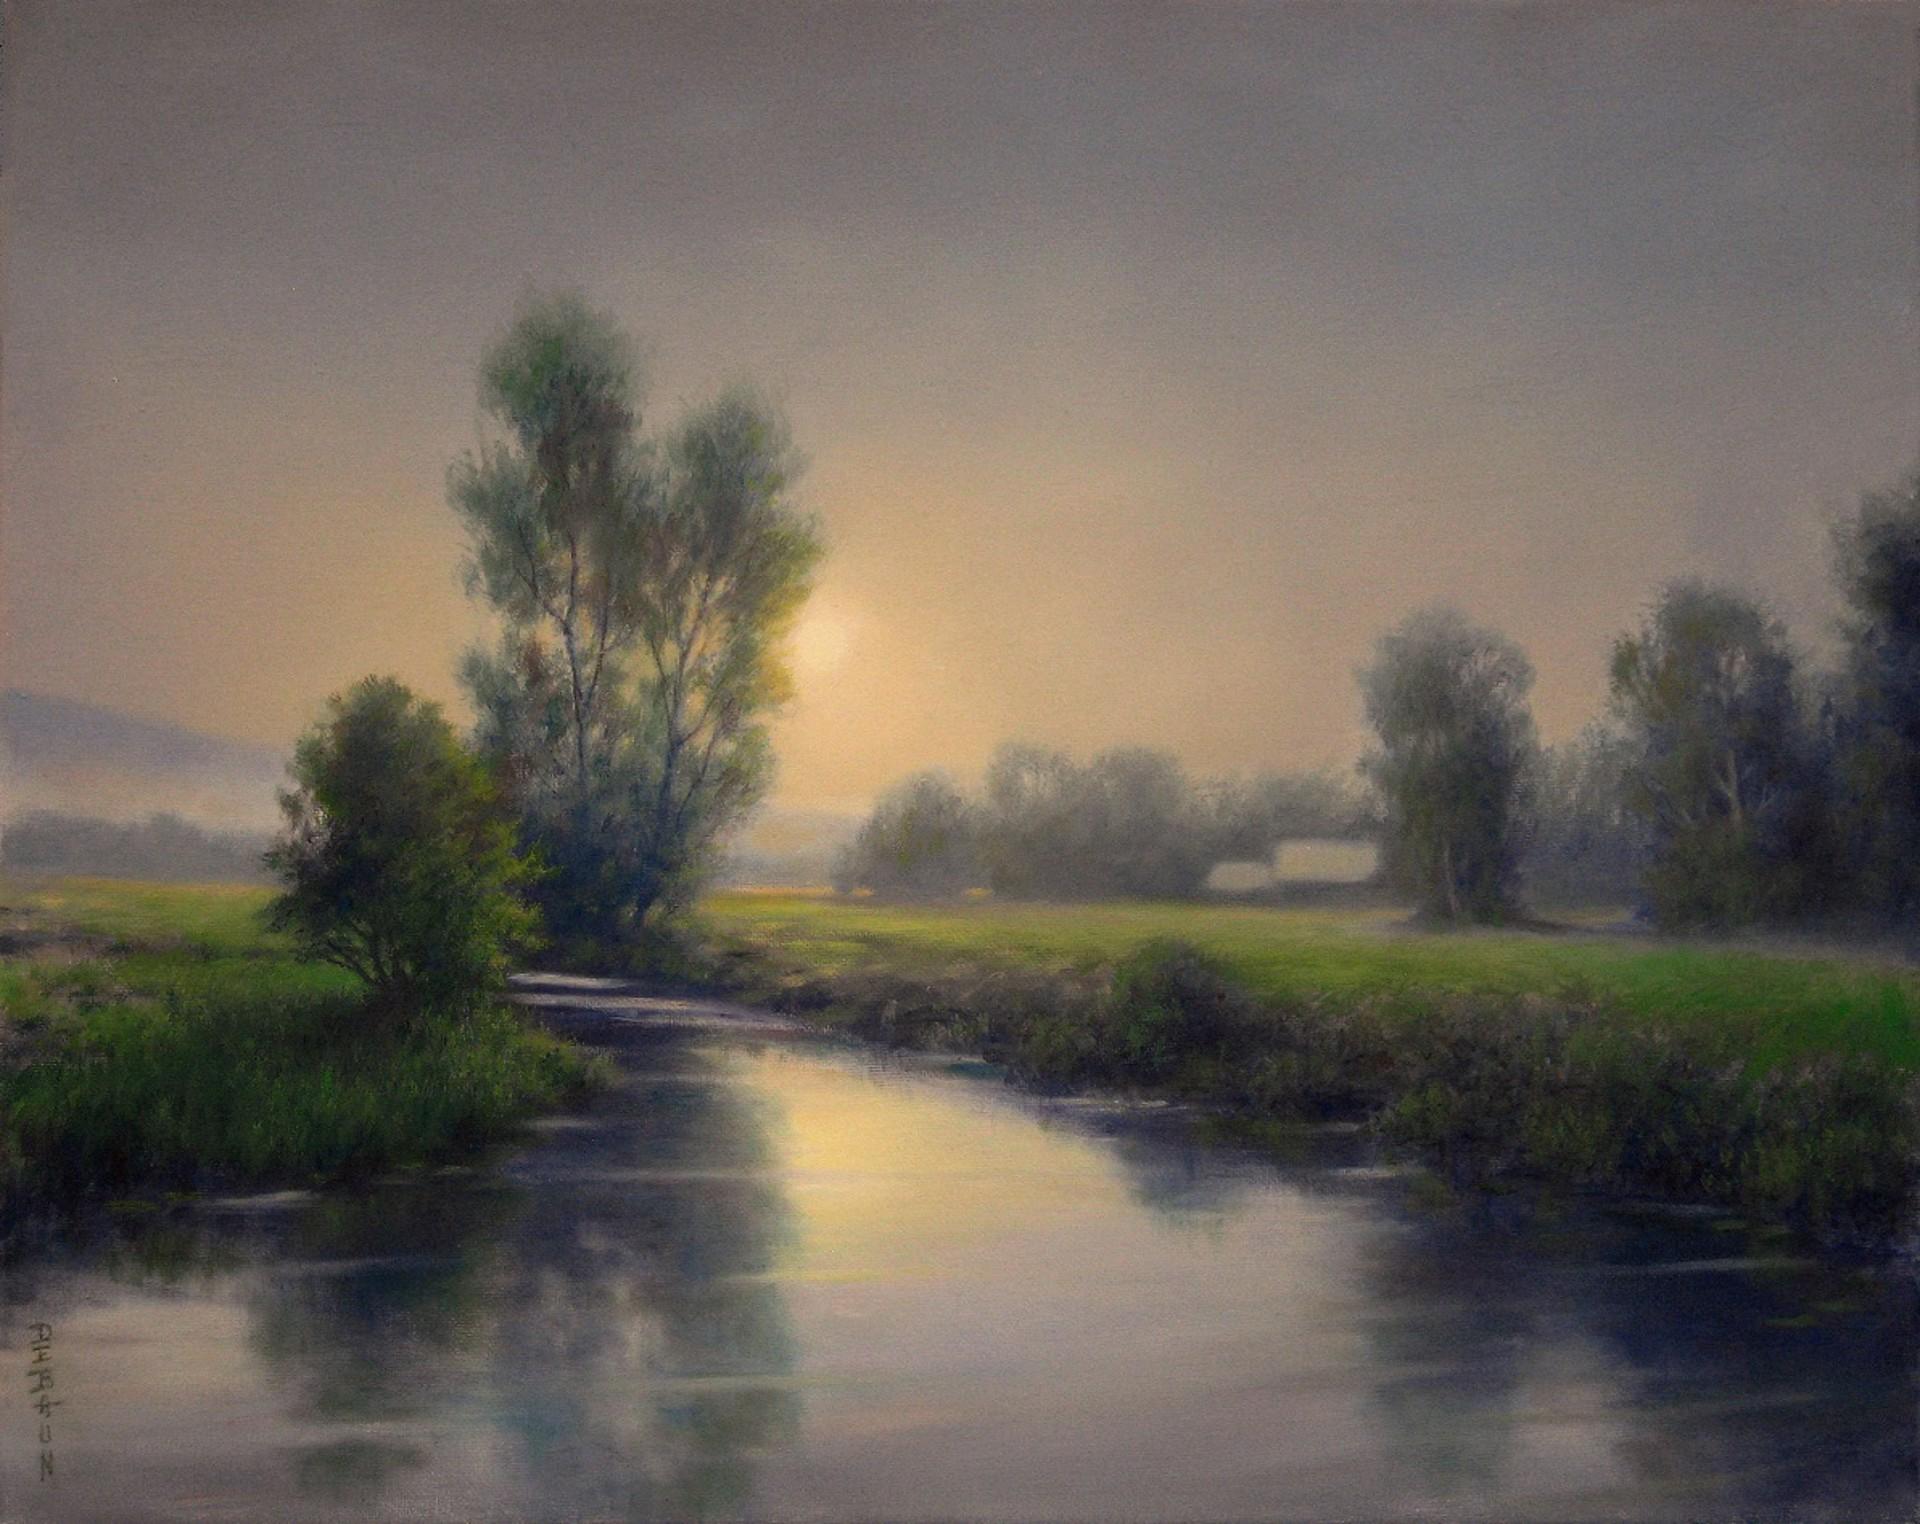 Serene Morning by Barry DeBaun